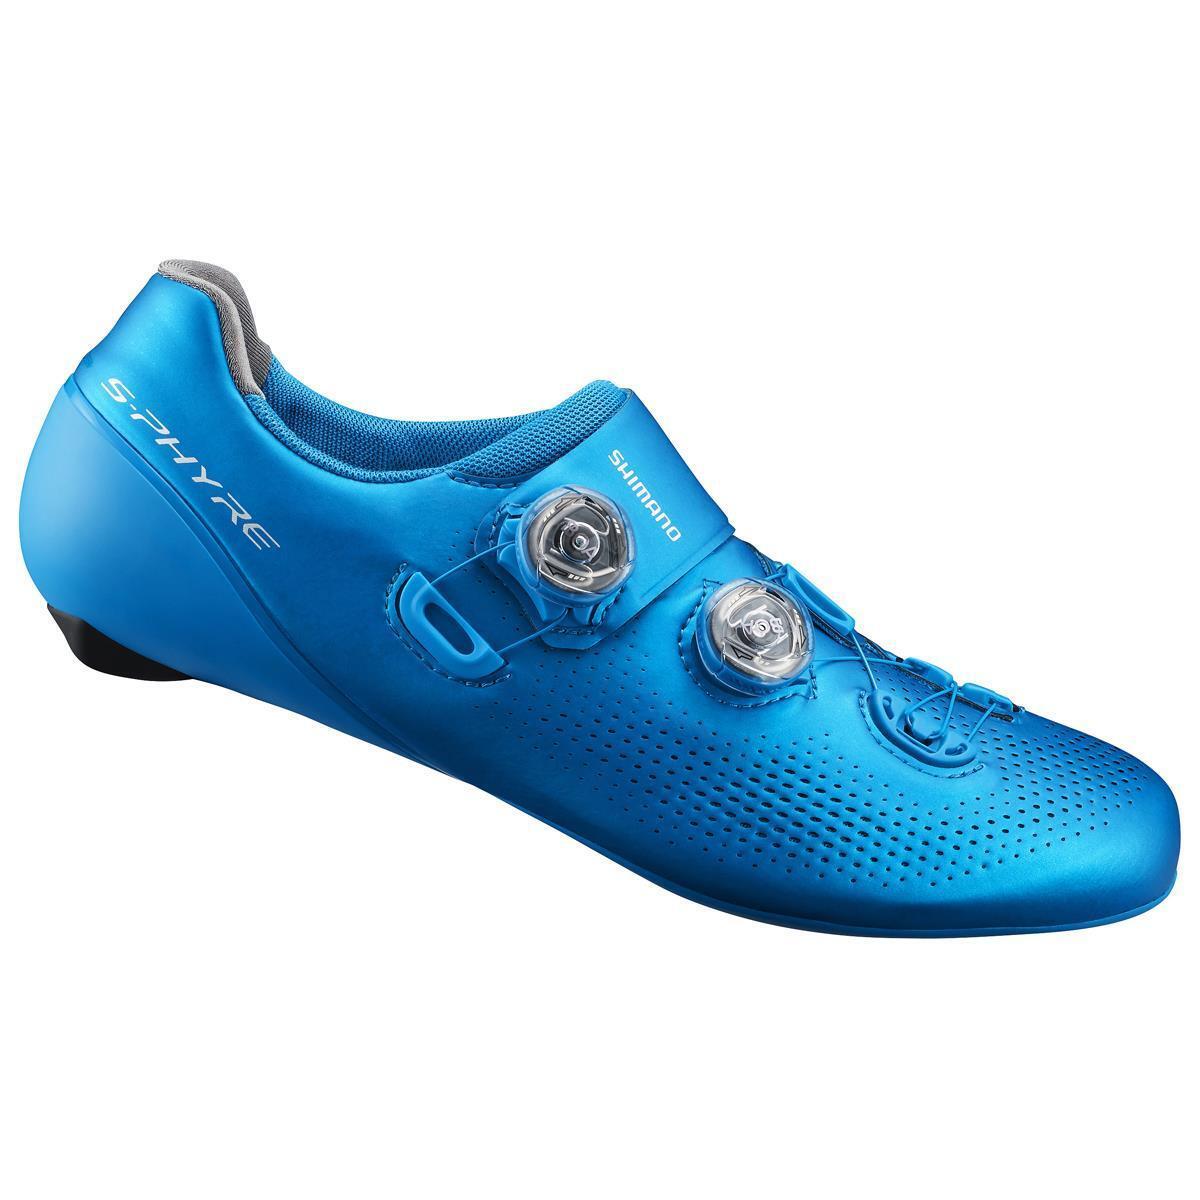 SHIMANO shoes de ville s-phyre rc9 sh-rc901sb1 blue 19 ESHRC901MCB01S43000